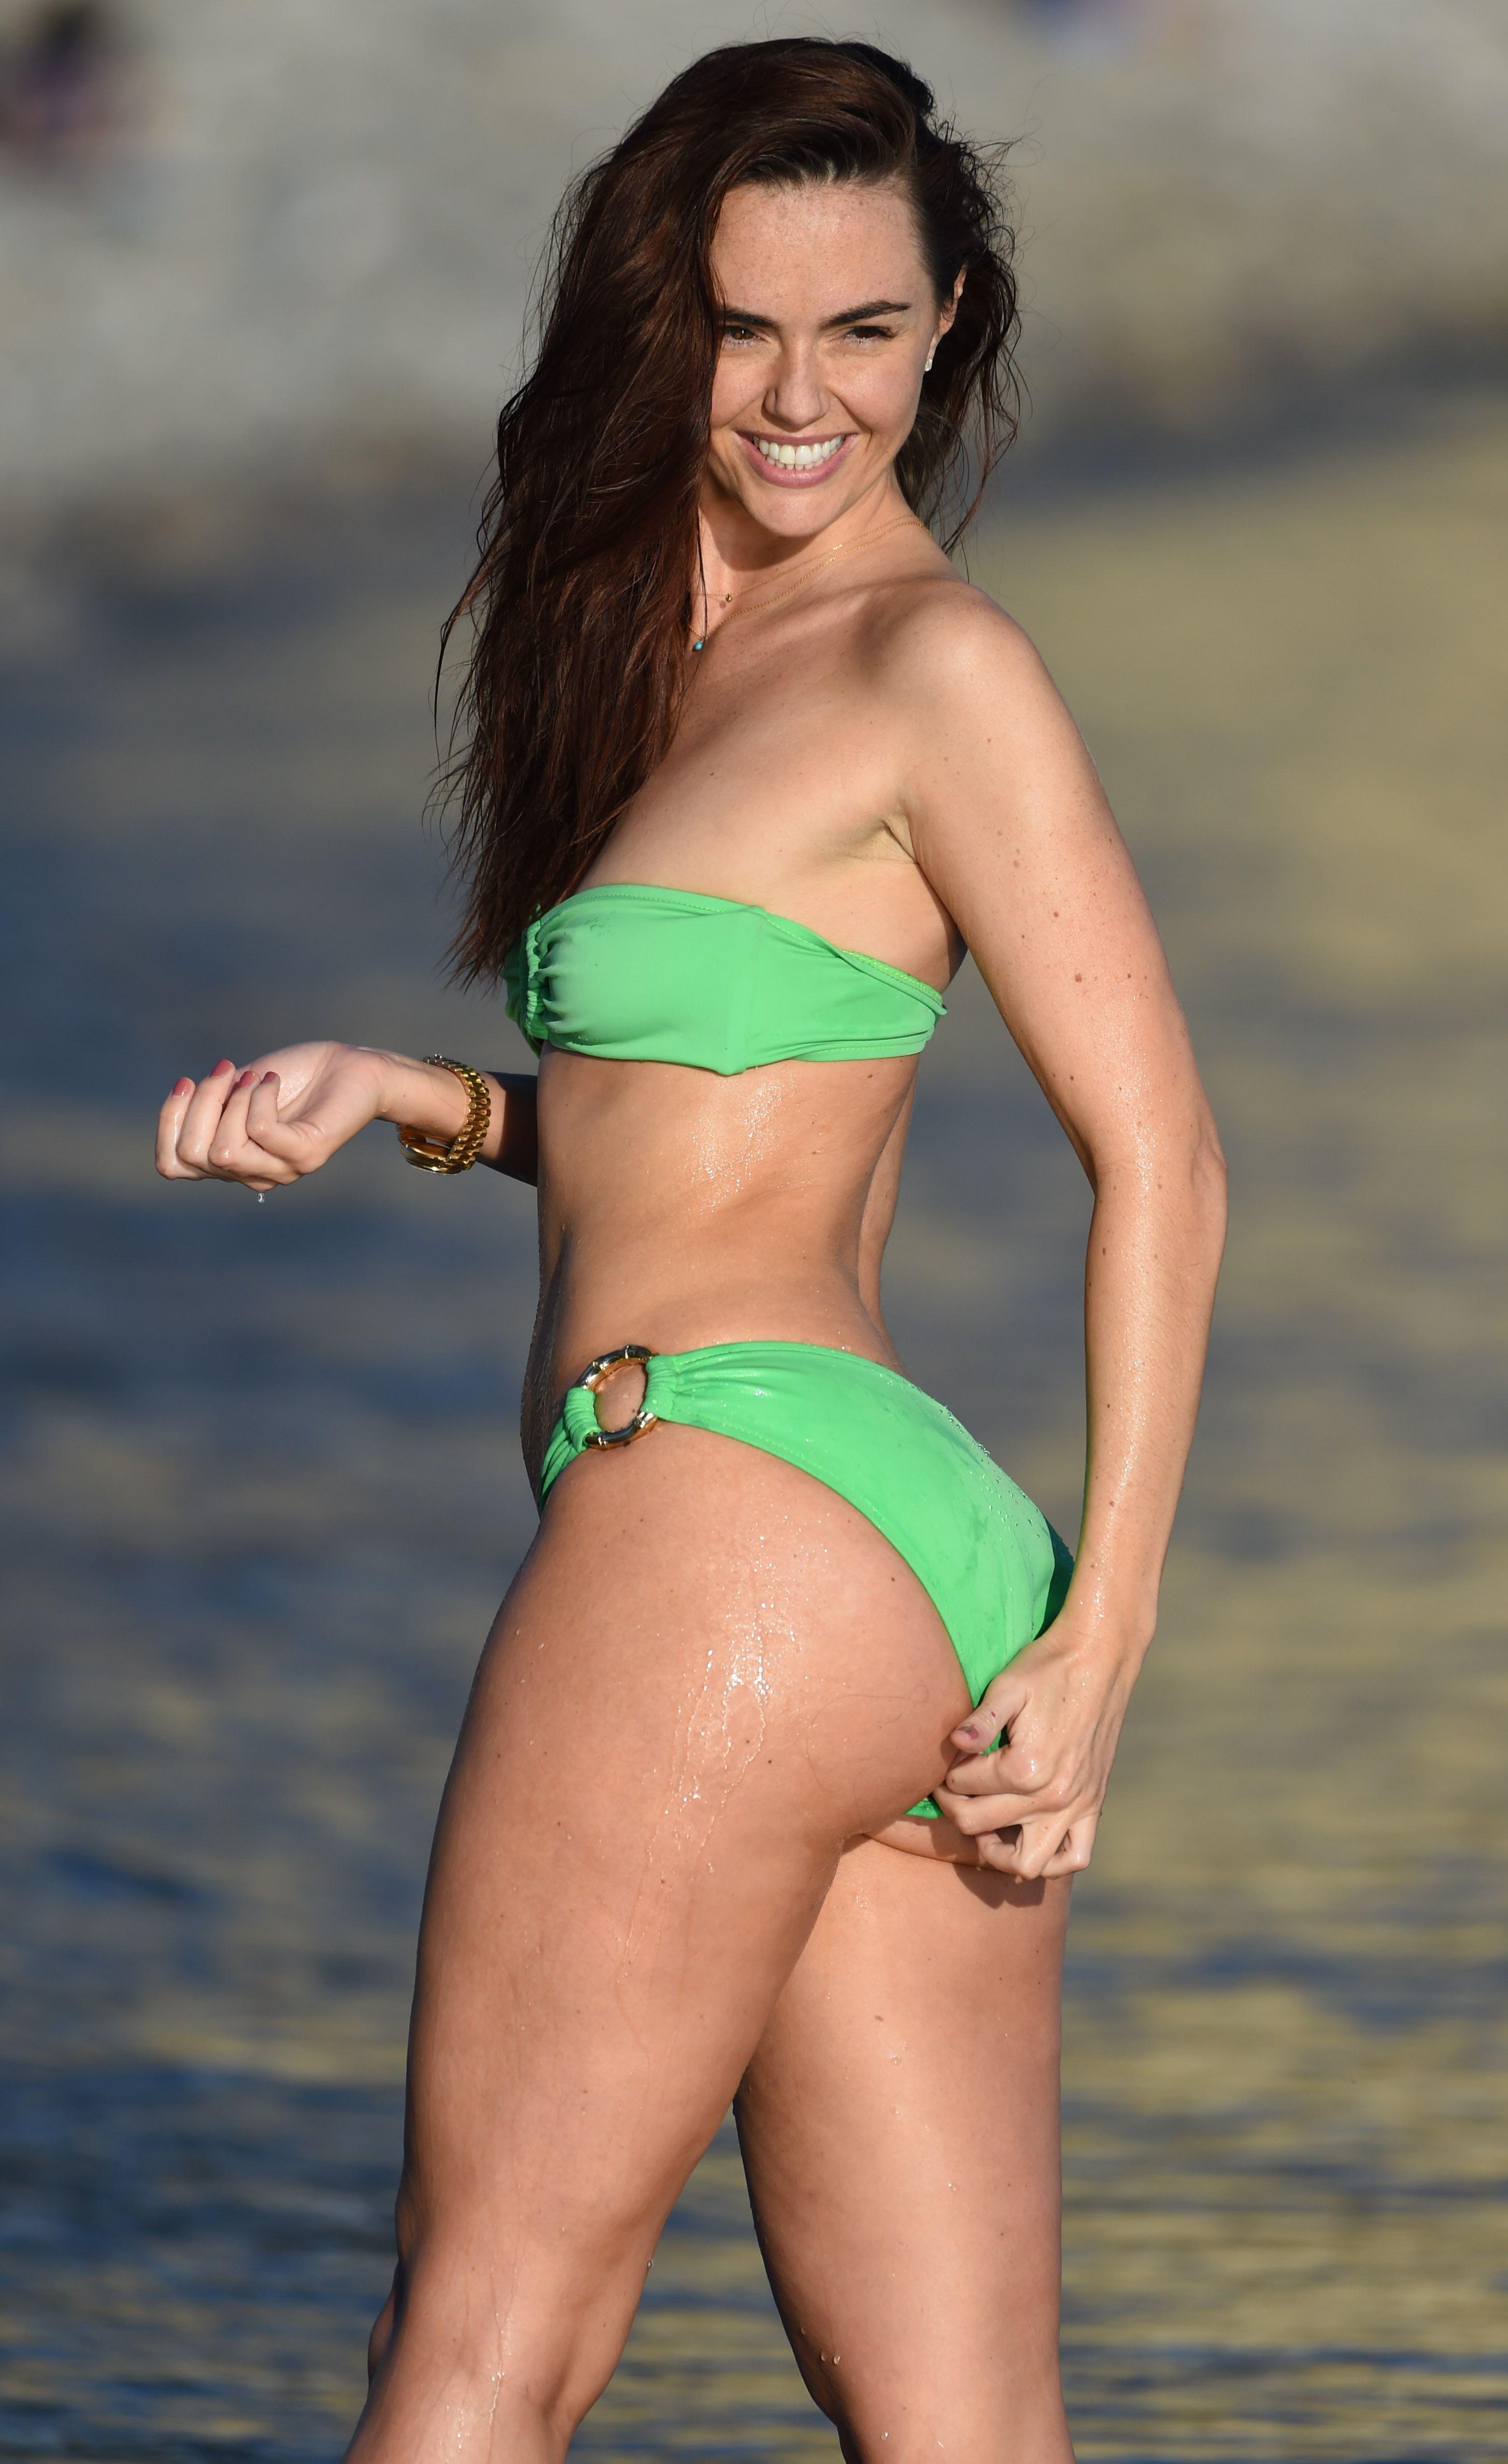 Cleavage Jennifer Metcalfe nudes (45 photos), Pussy, Leaked, Feet, underwear 2020